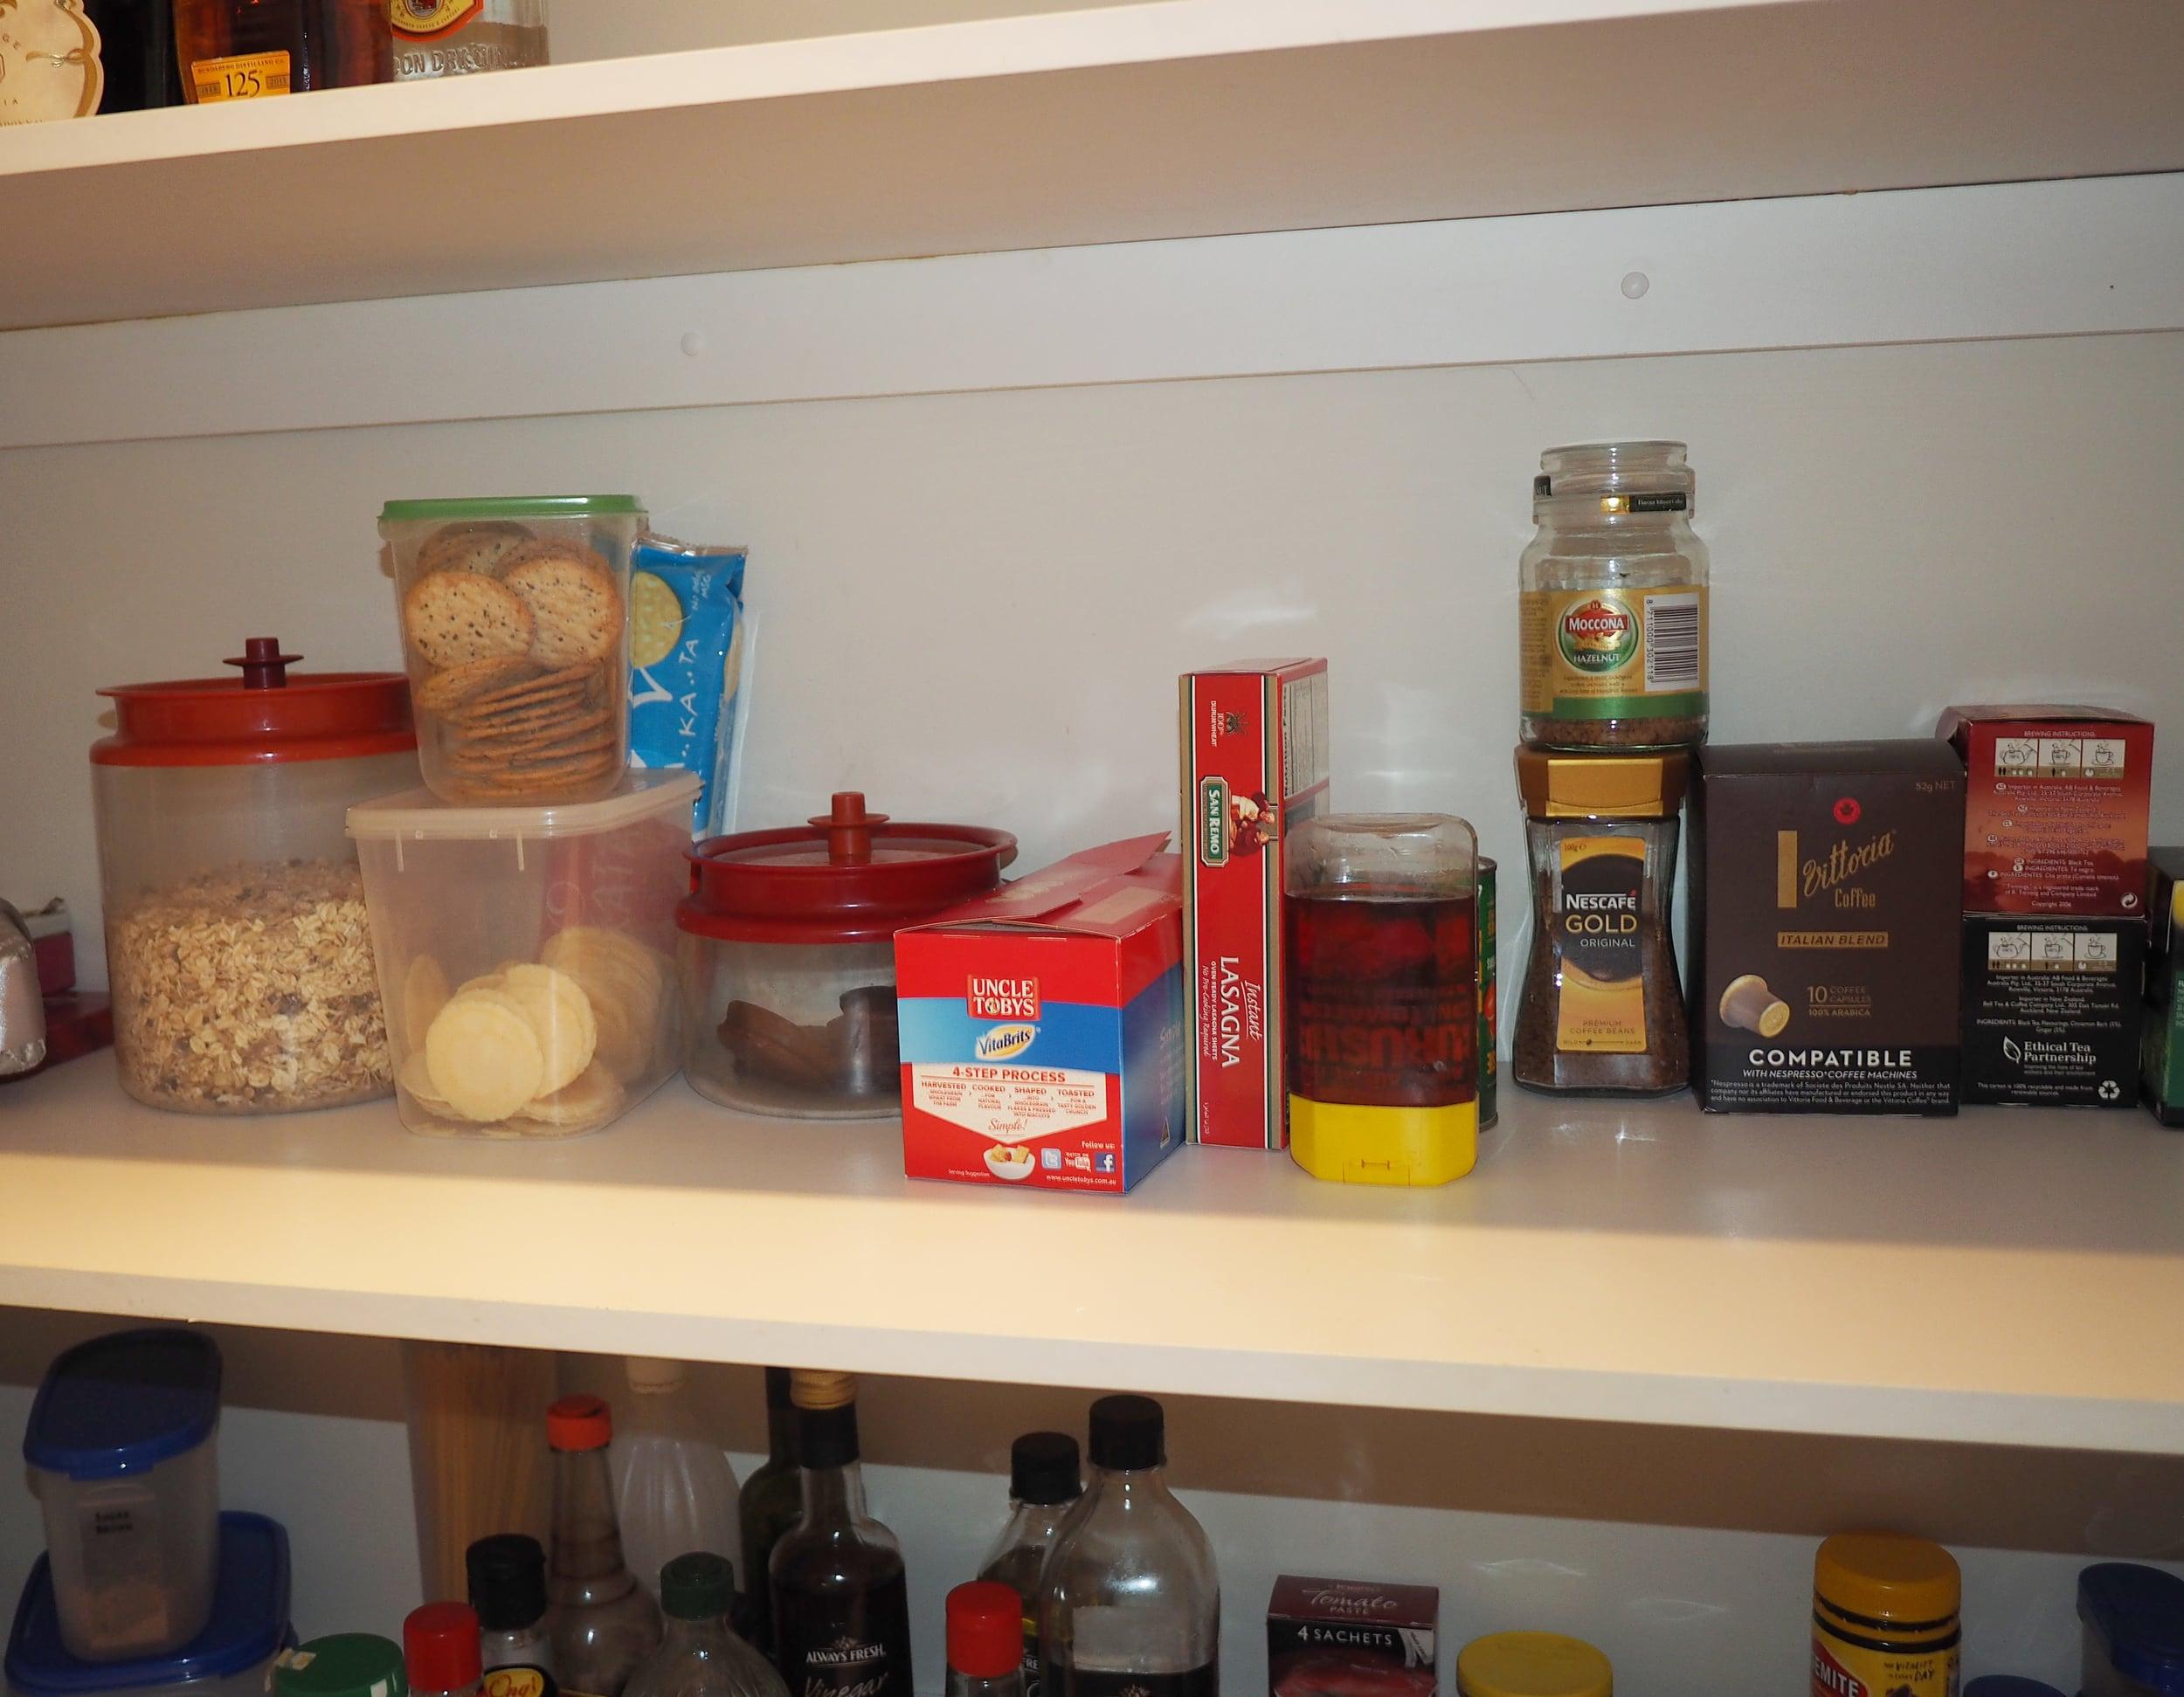 organising food items in a pantry